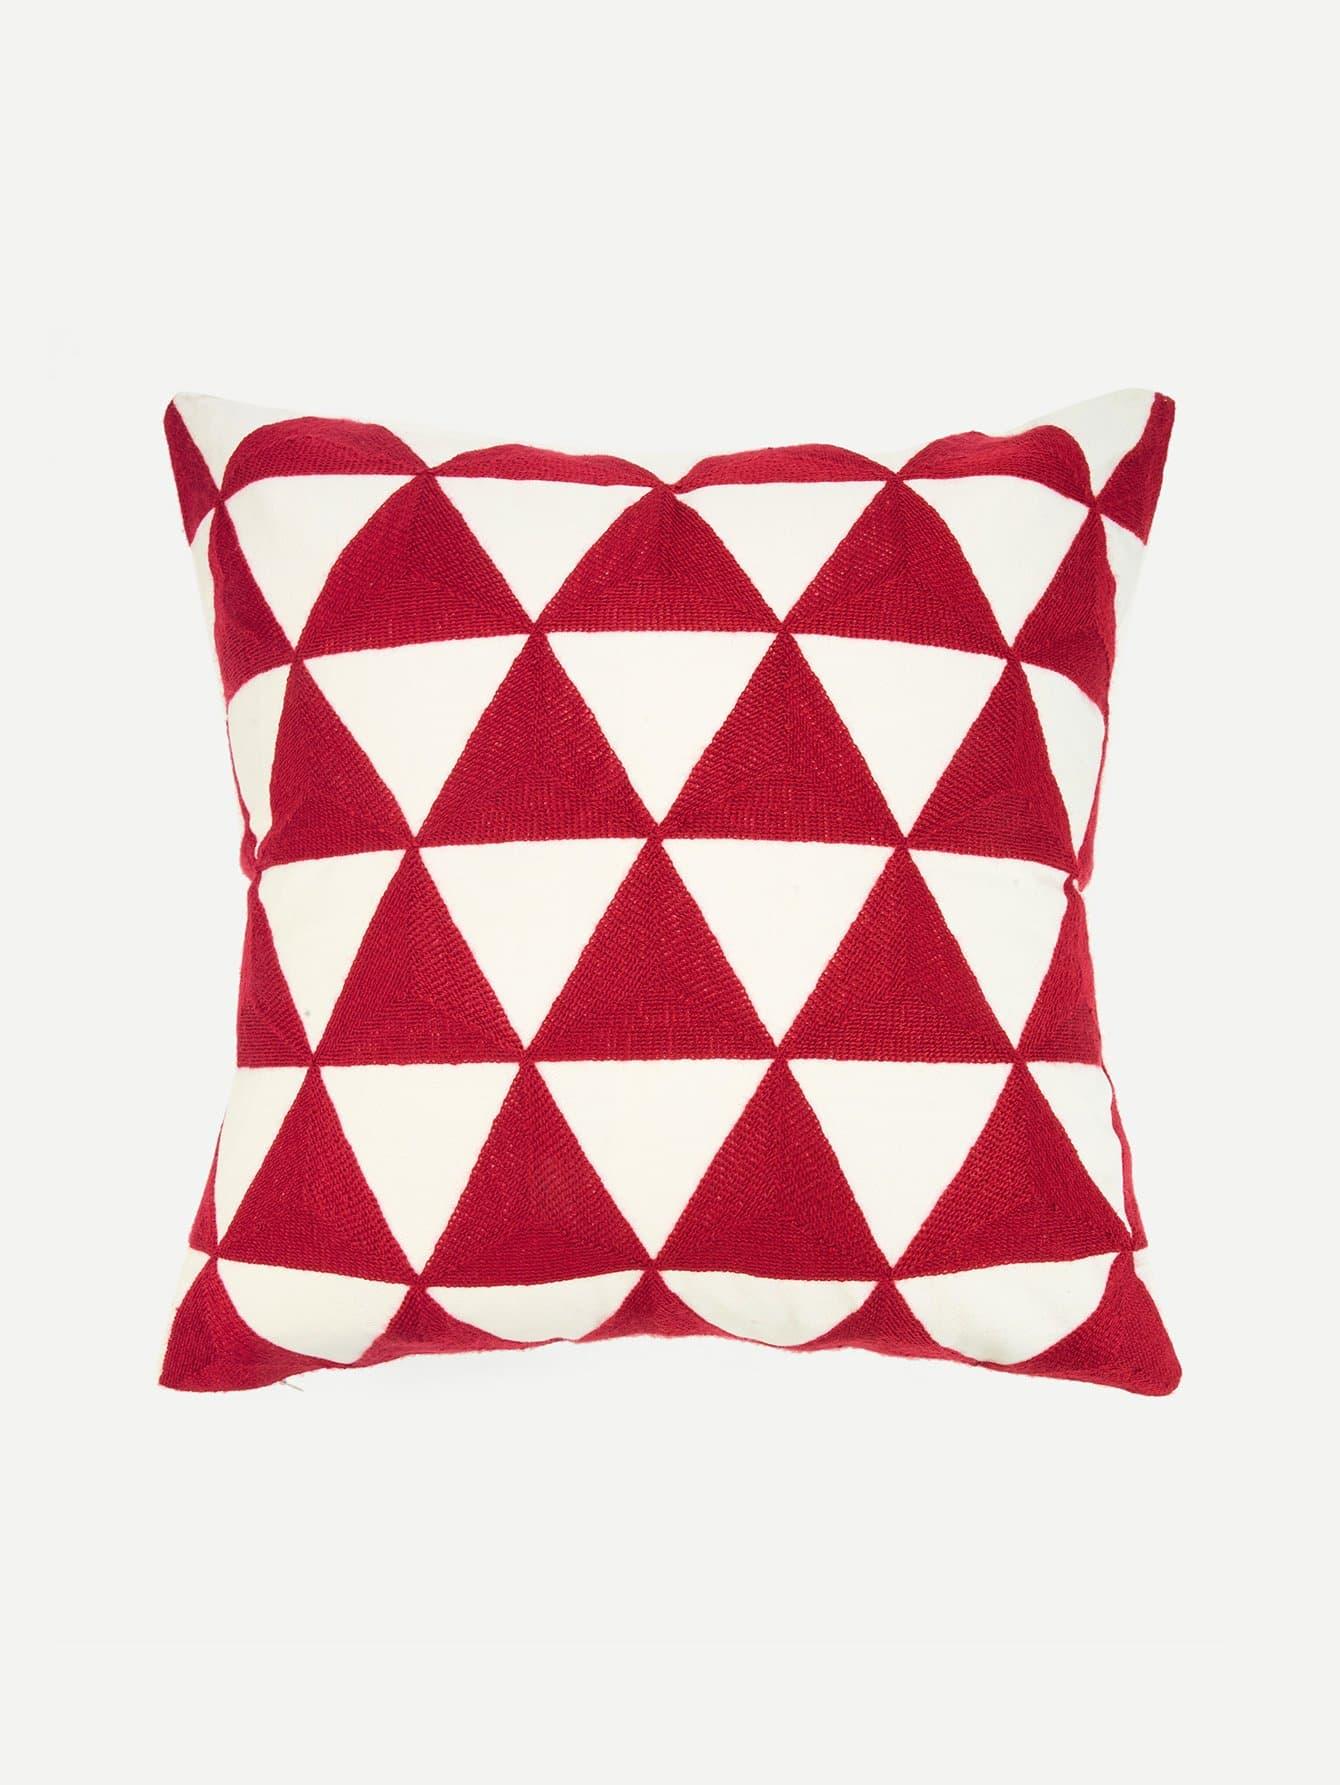 Купить Наволочка для подушка вышивка геометрия 1 шт, null, SheIn